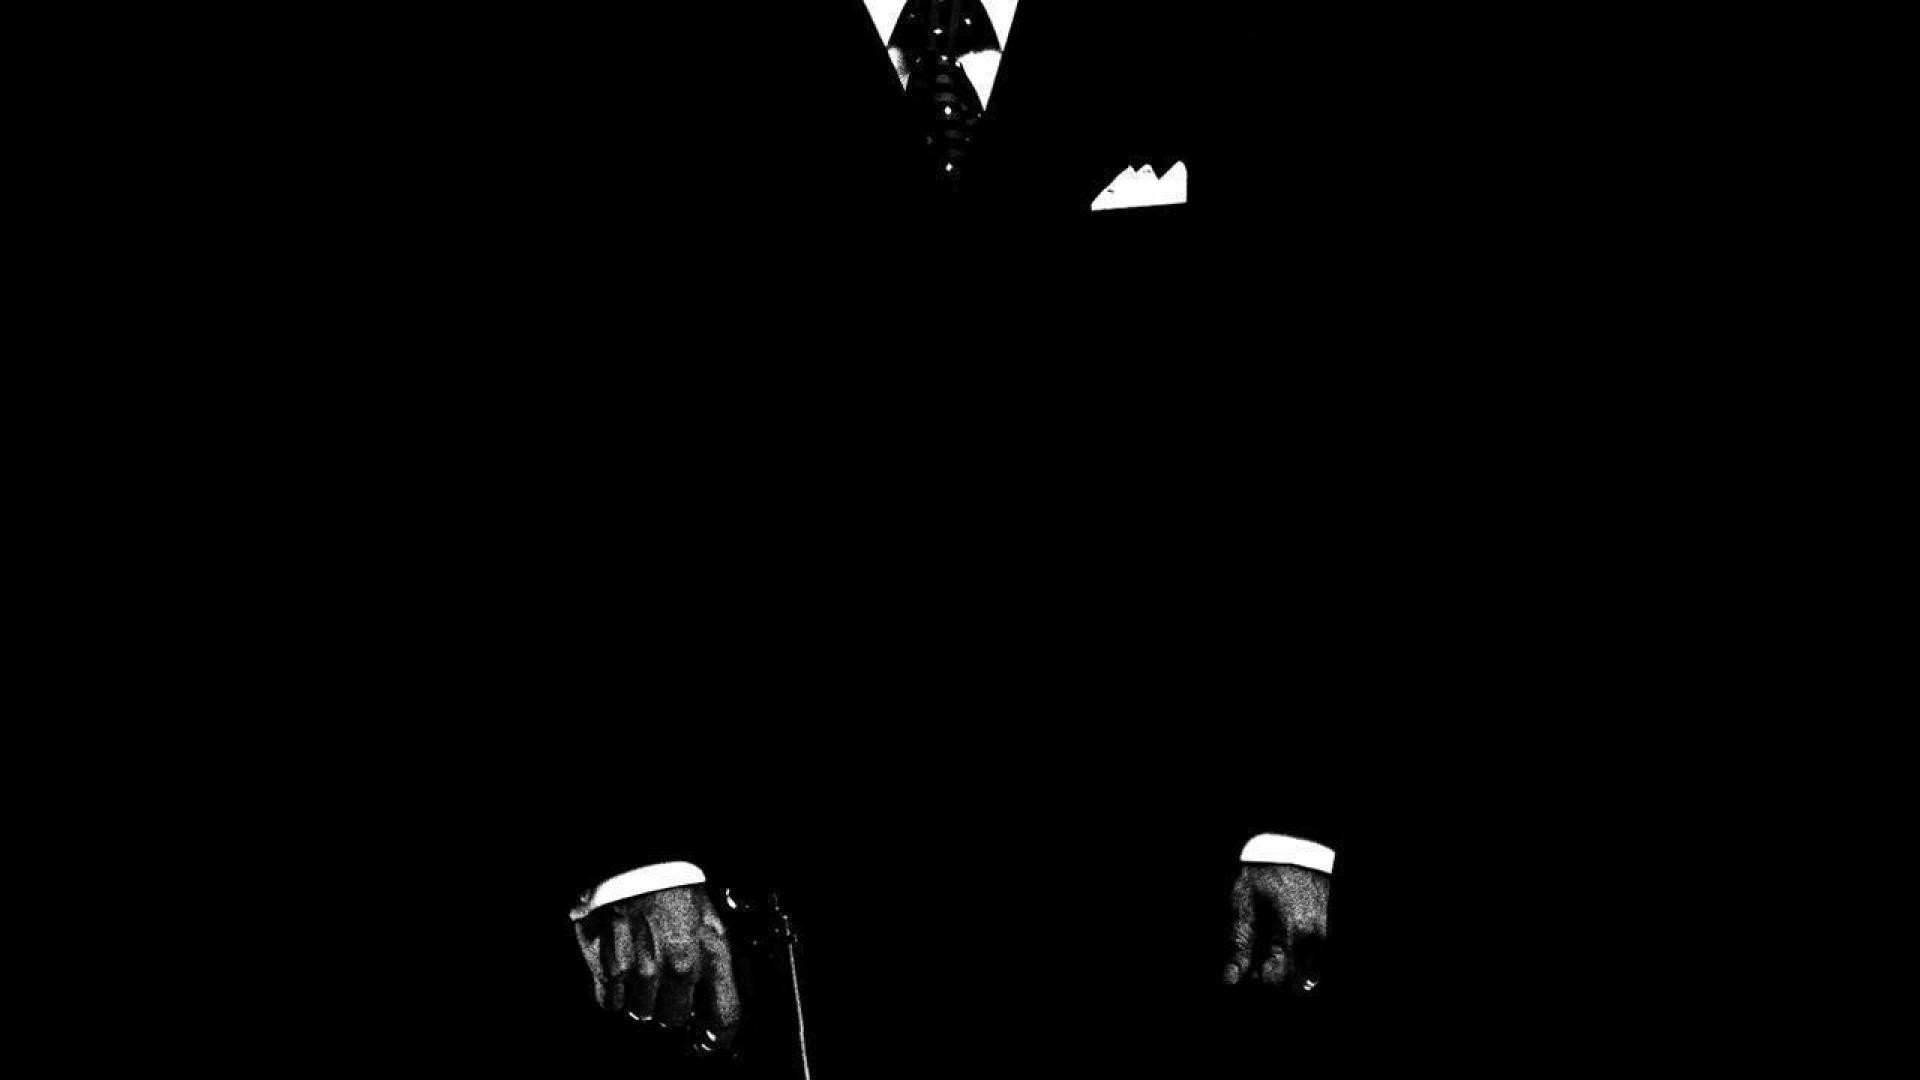 mafia gangster black hd wallpaper – (#14317) – HQ Desktop Wallpapers .